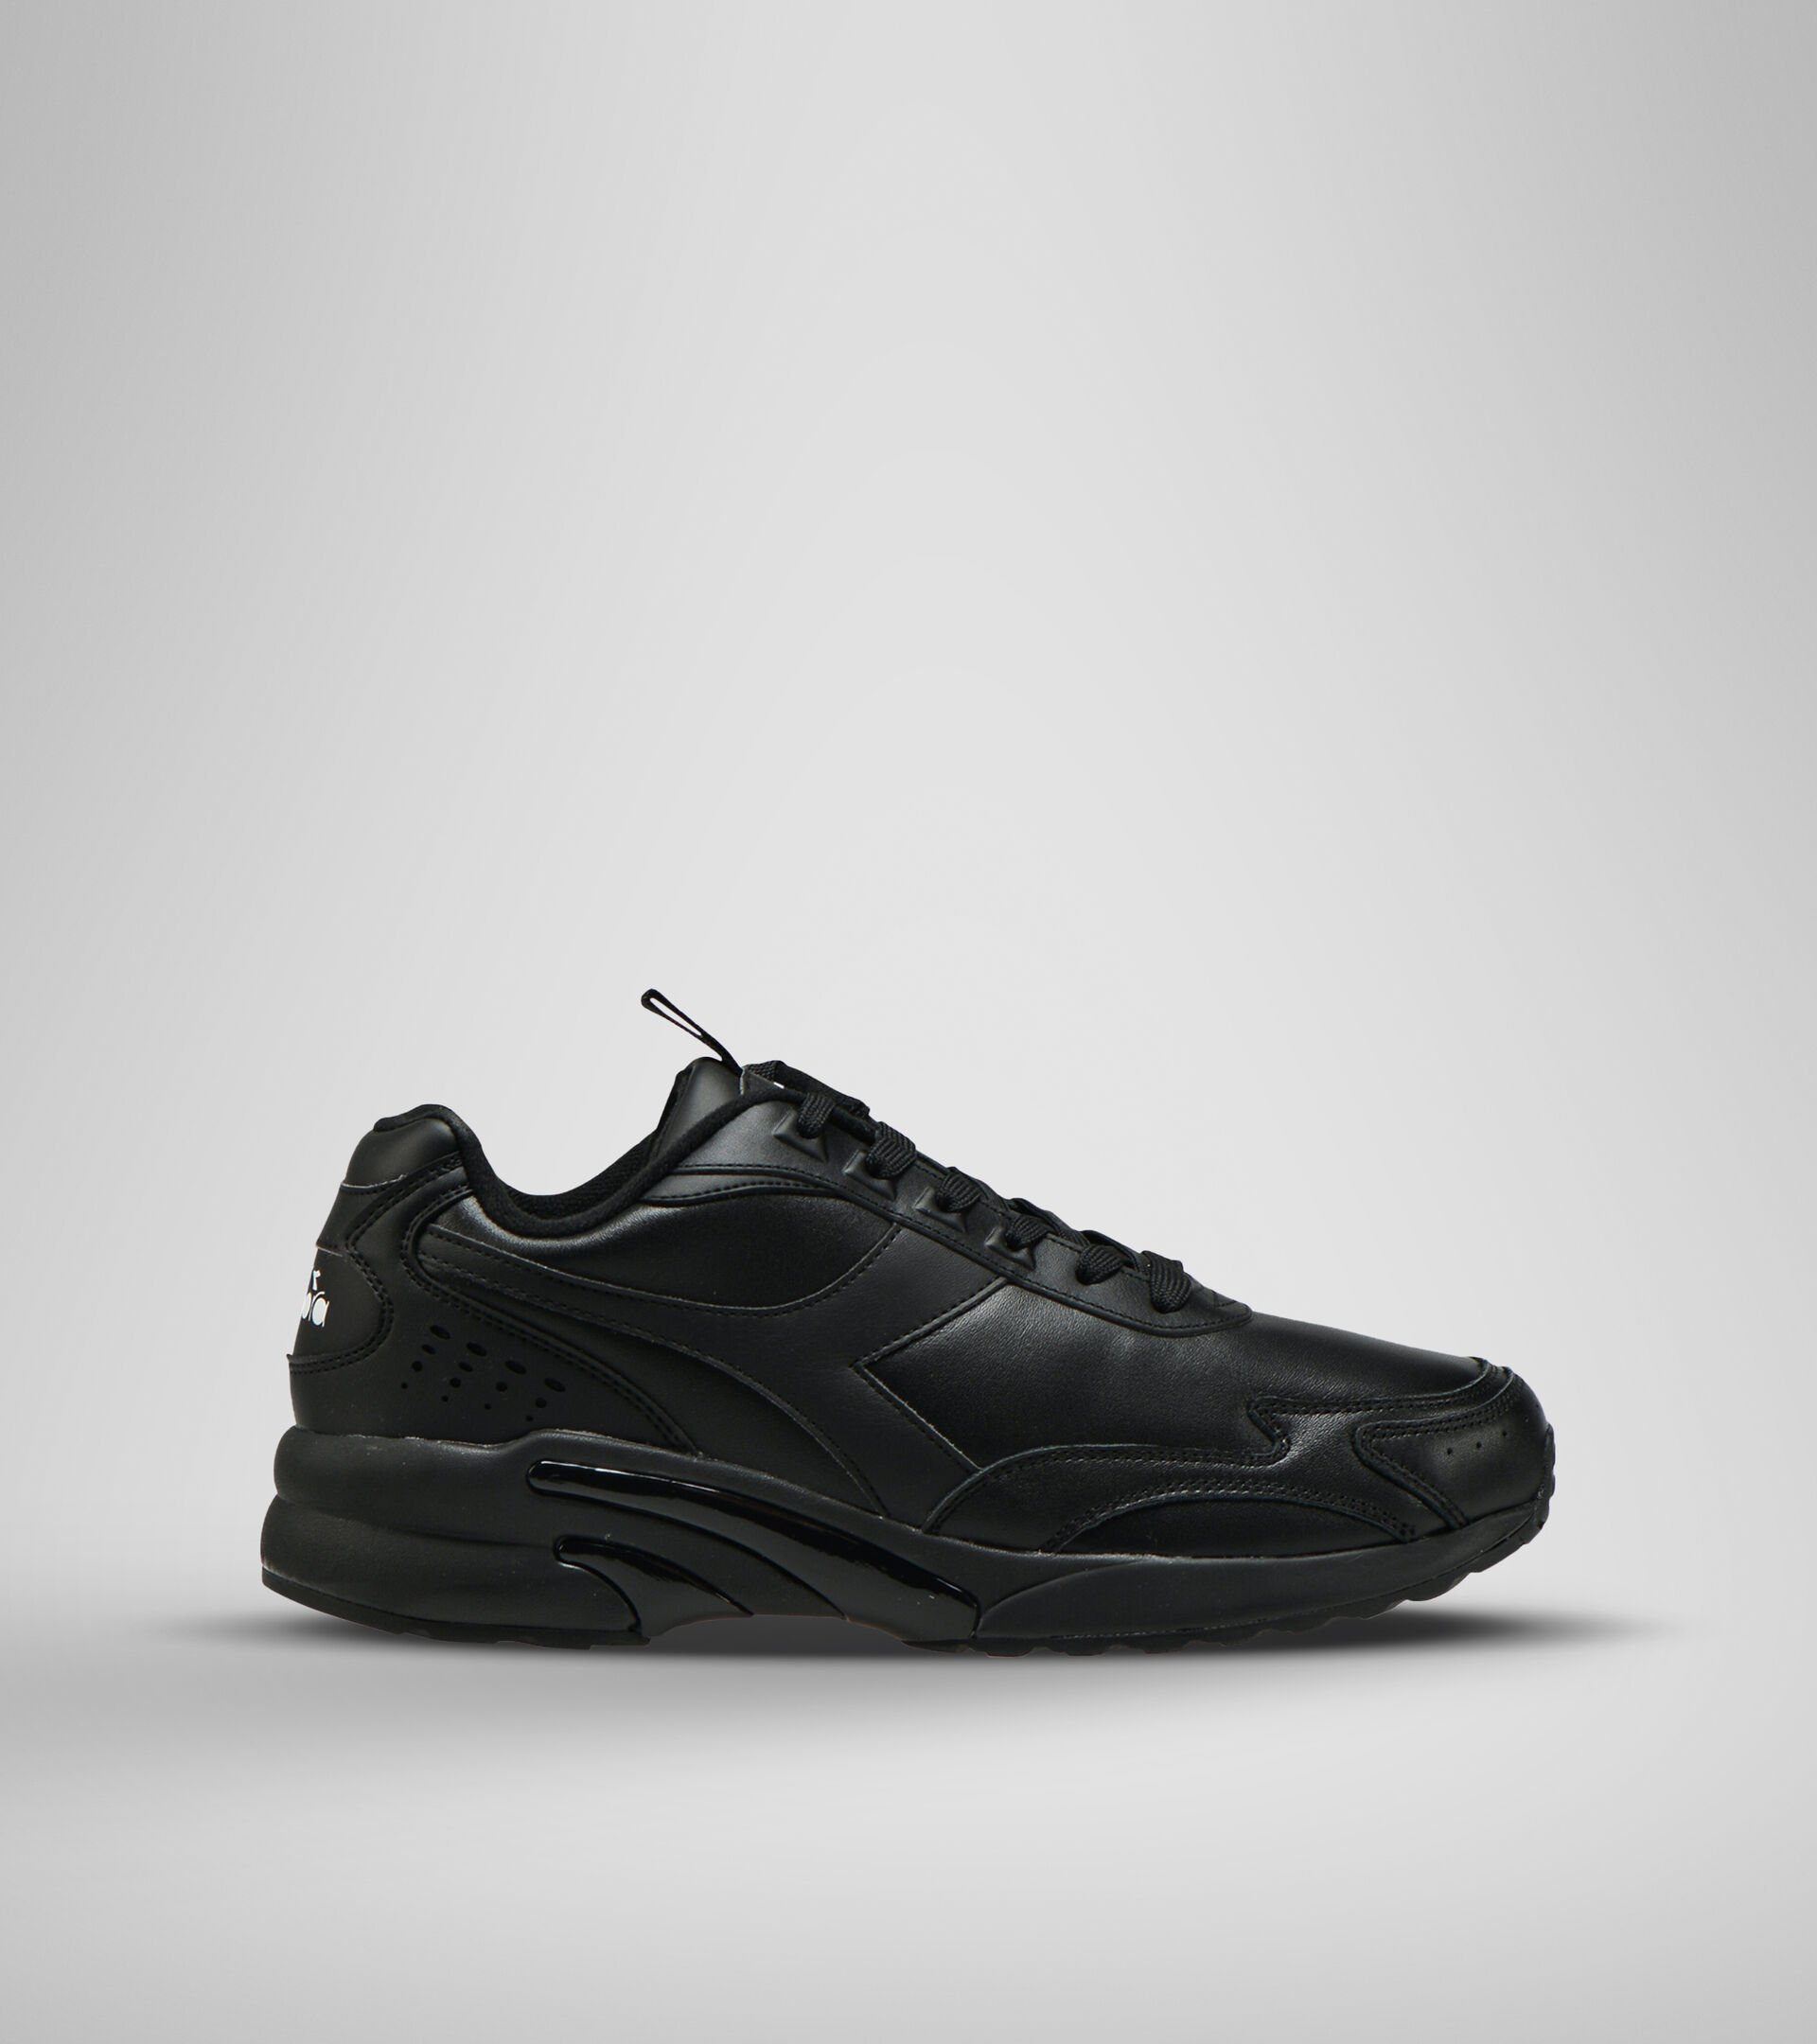 Zapatillas deportivas - Unisex DISTANCE 280 LEATHER NEGRO/NEGRO/NEGRO - Diadora